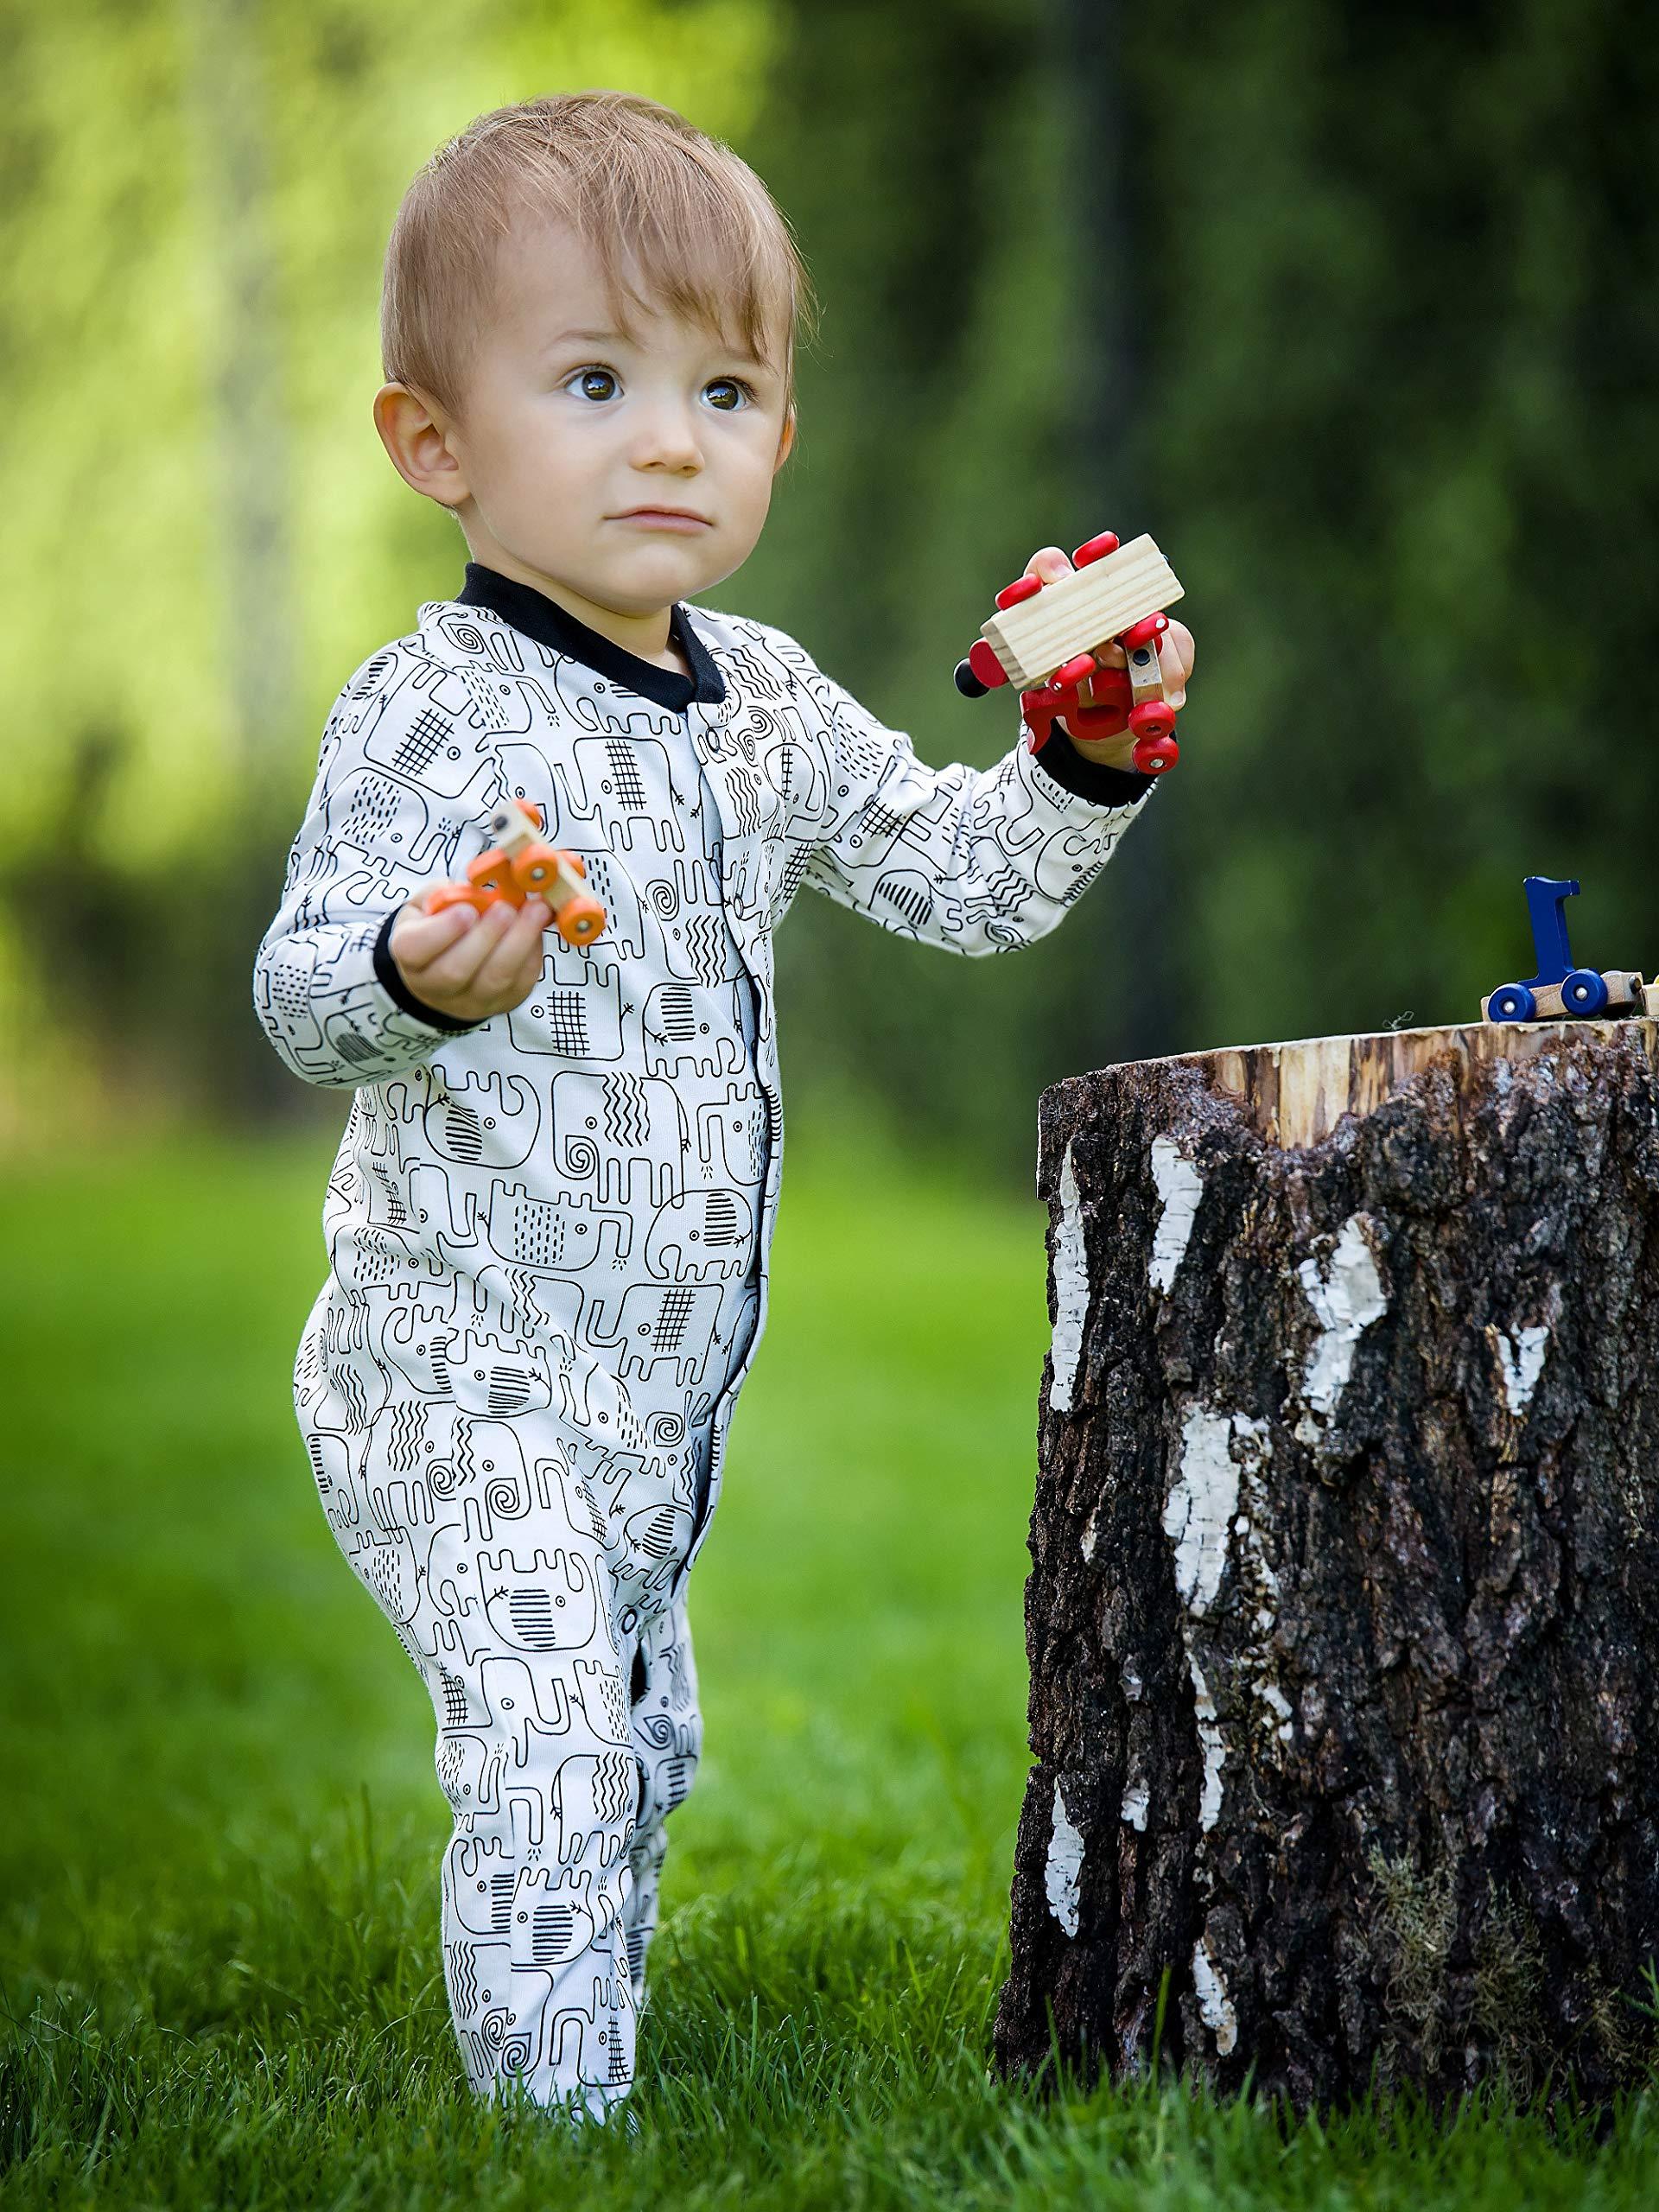 Sibinulo Niño Niña Pijama Bebé Pelele de ABS -Tamaños 80-92 - Pack de 4 2